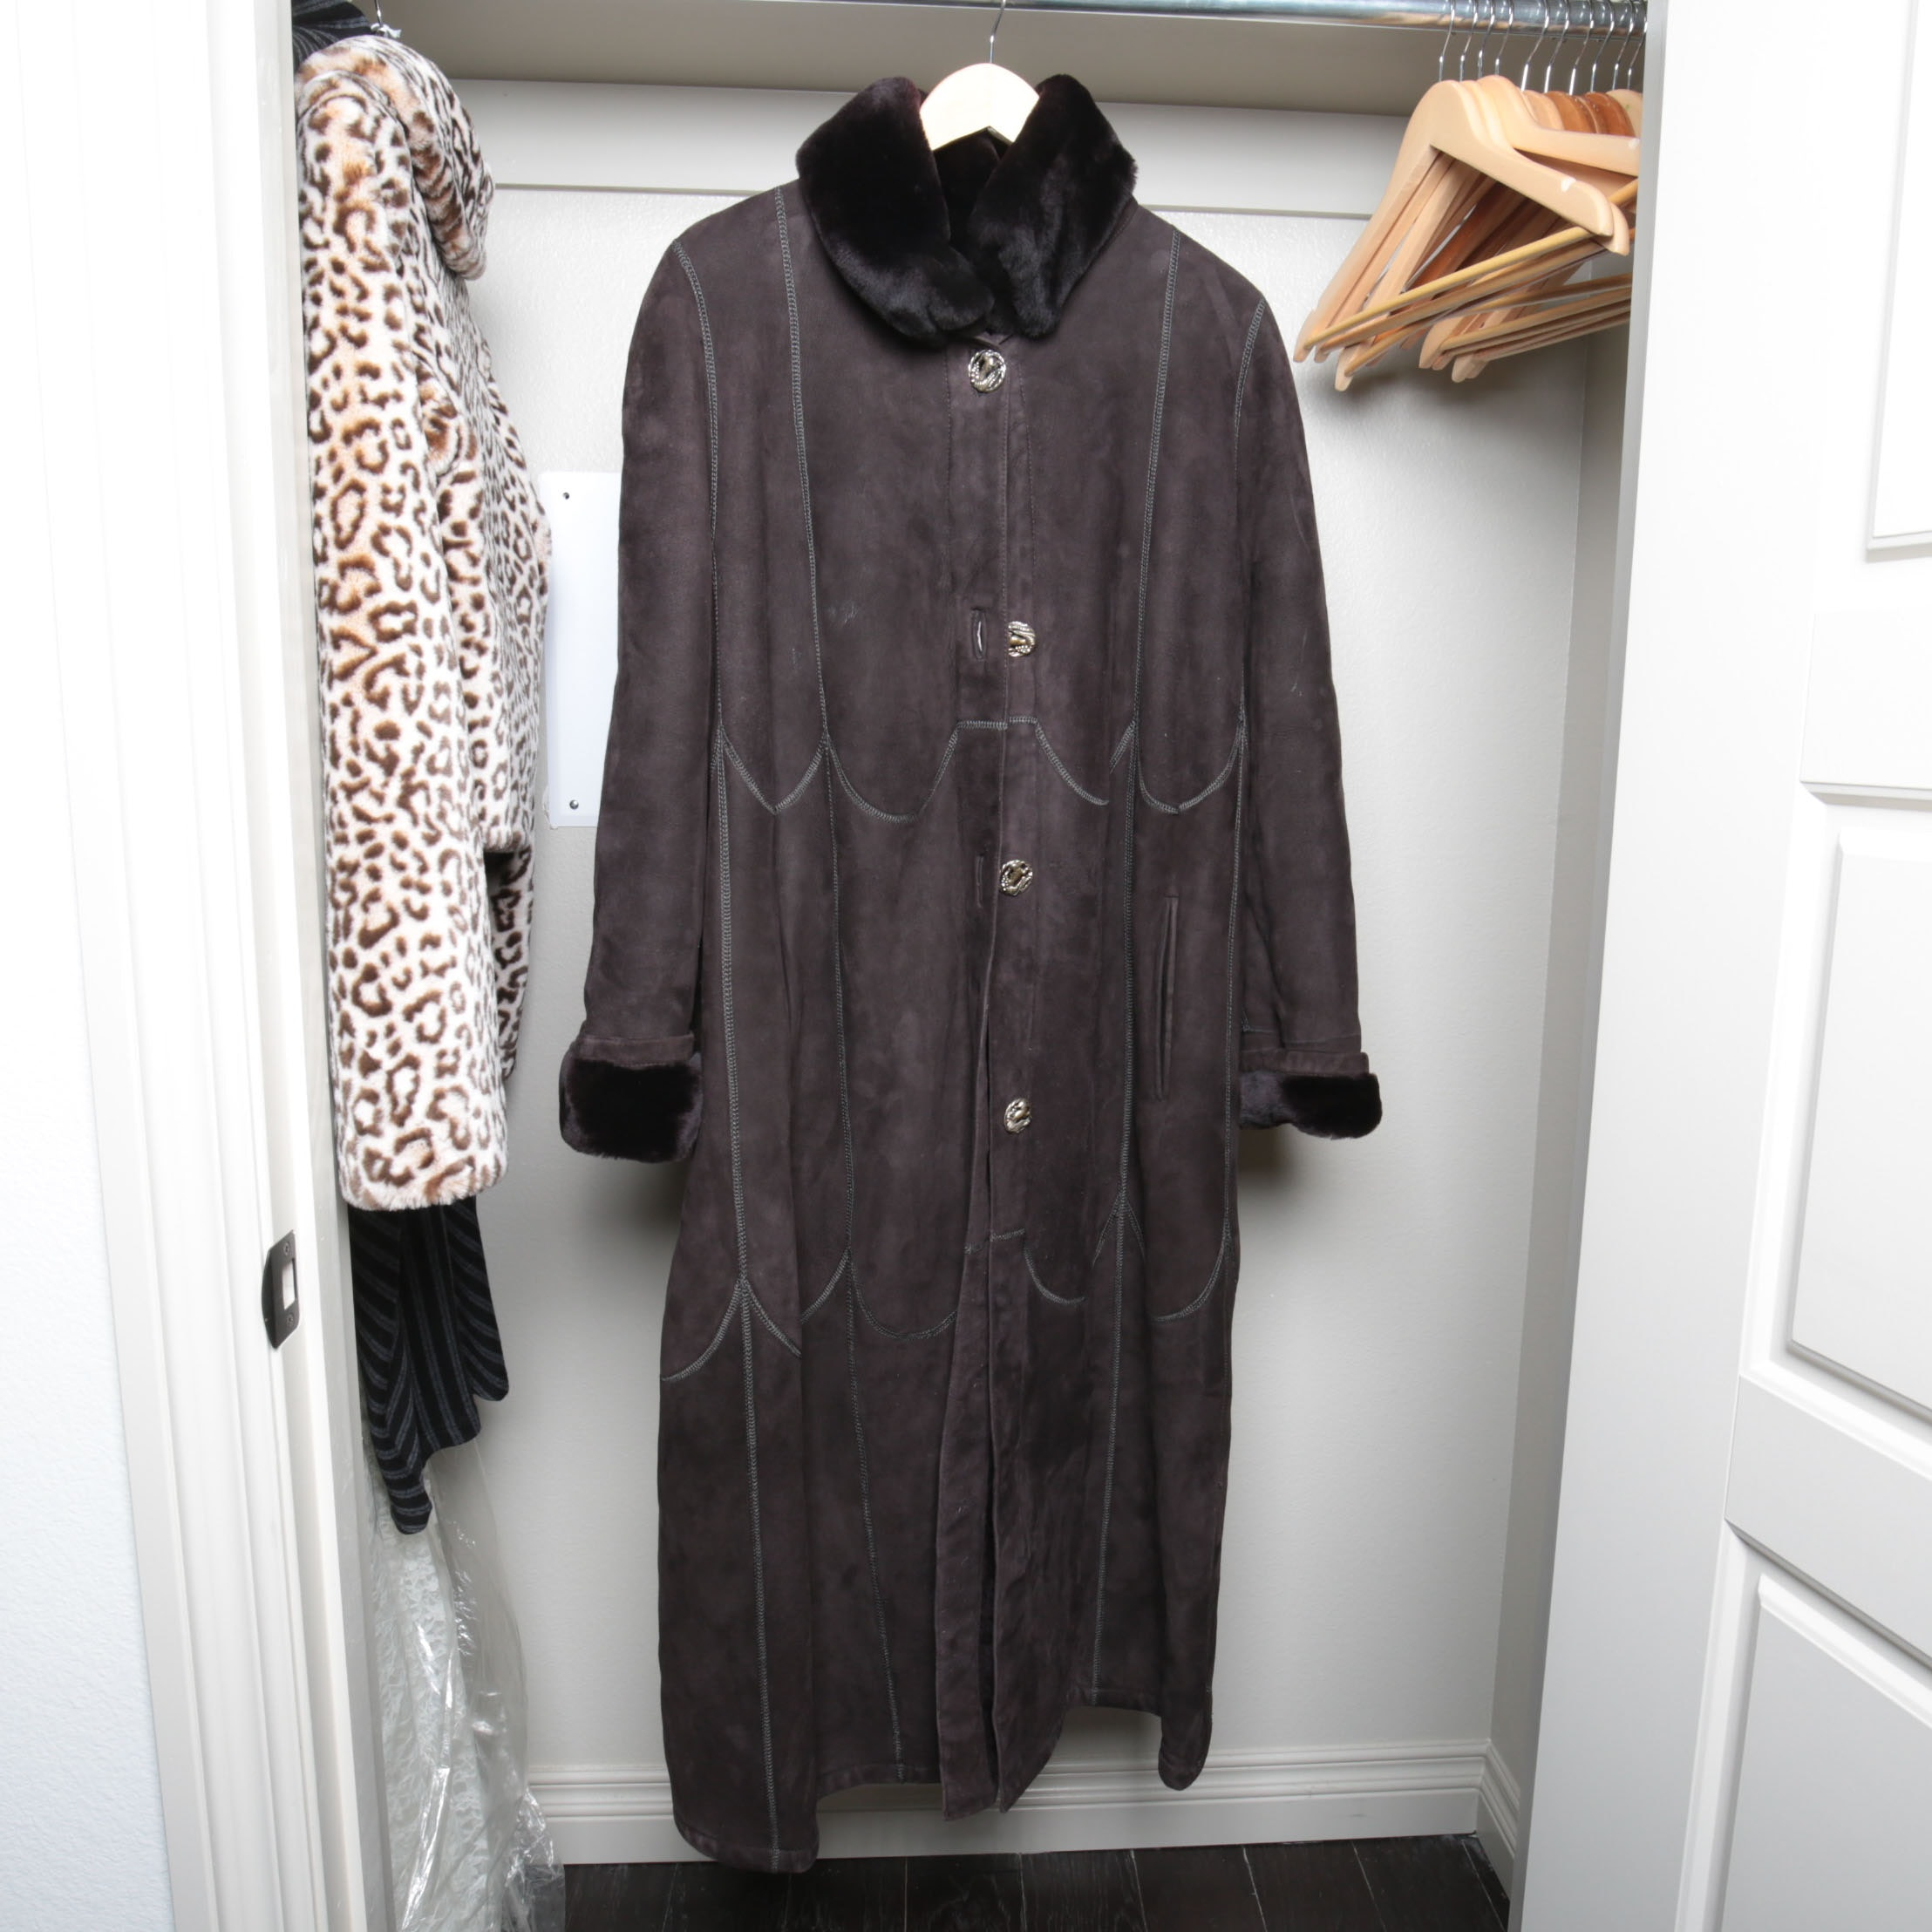 Birger Christensen Coat